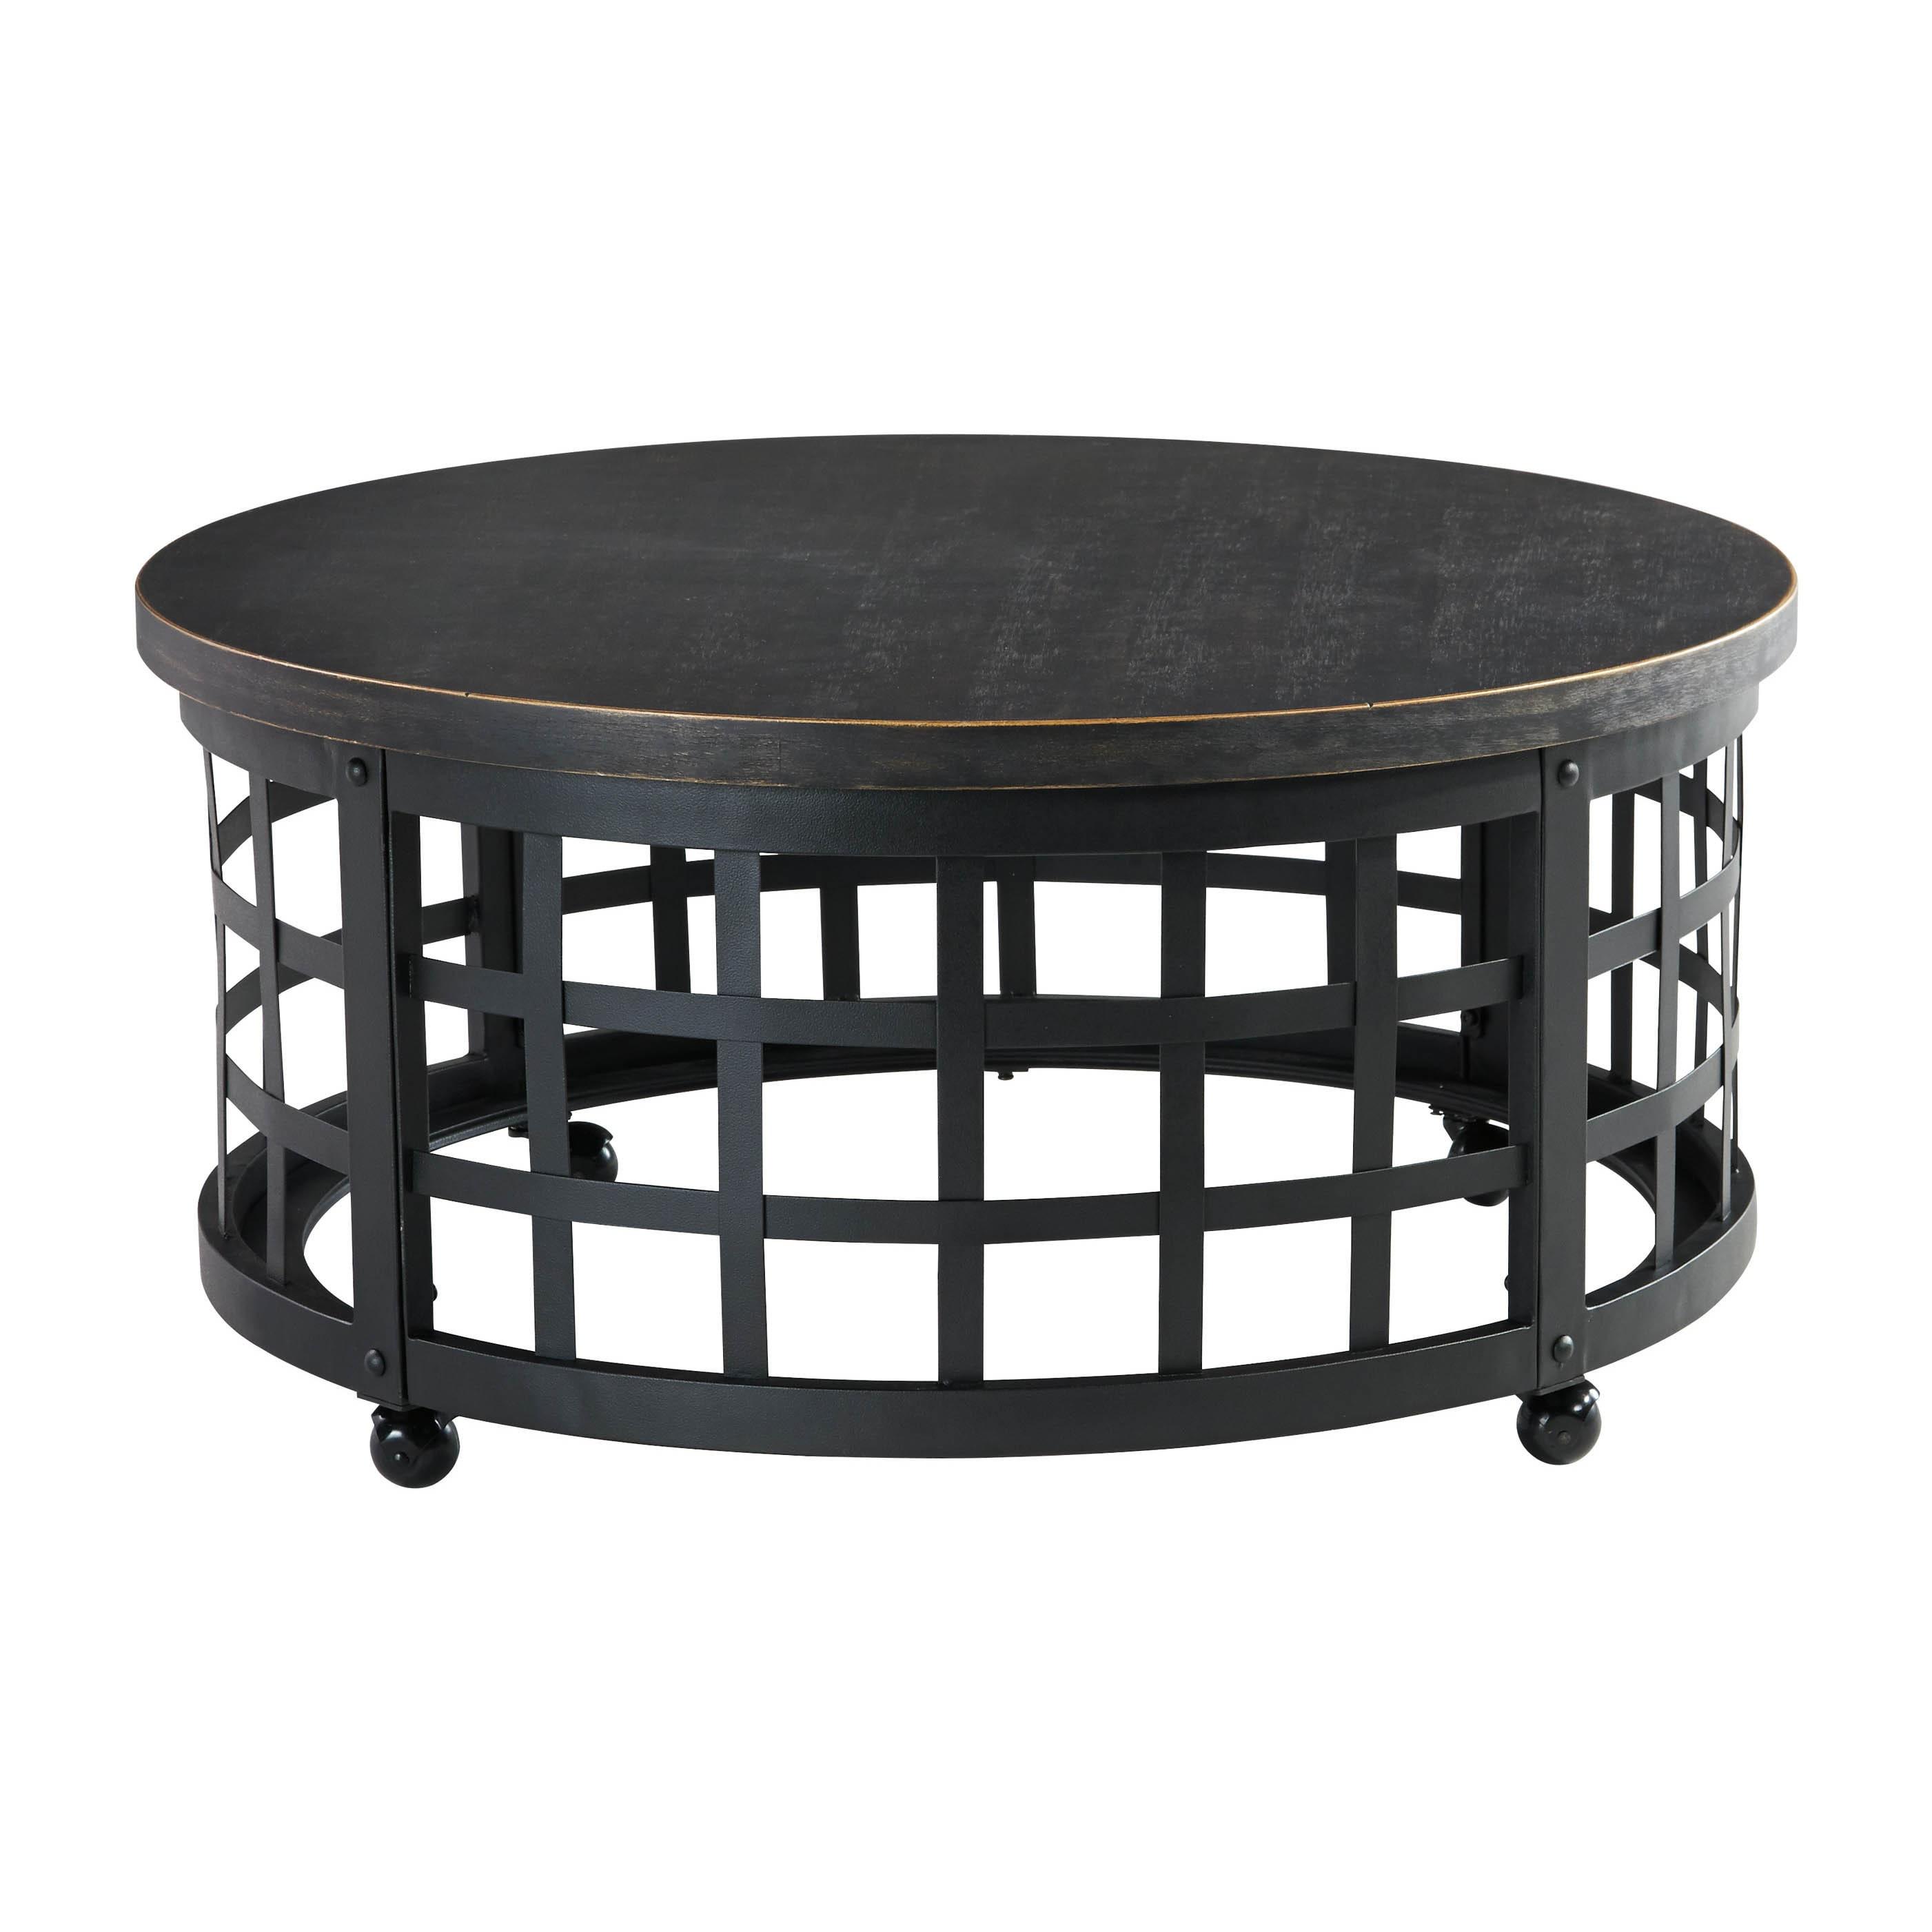 Signature Design by Ashley Marimon Black Round Cocktail Table